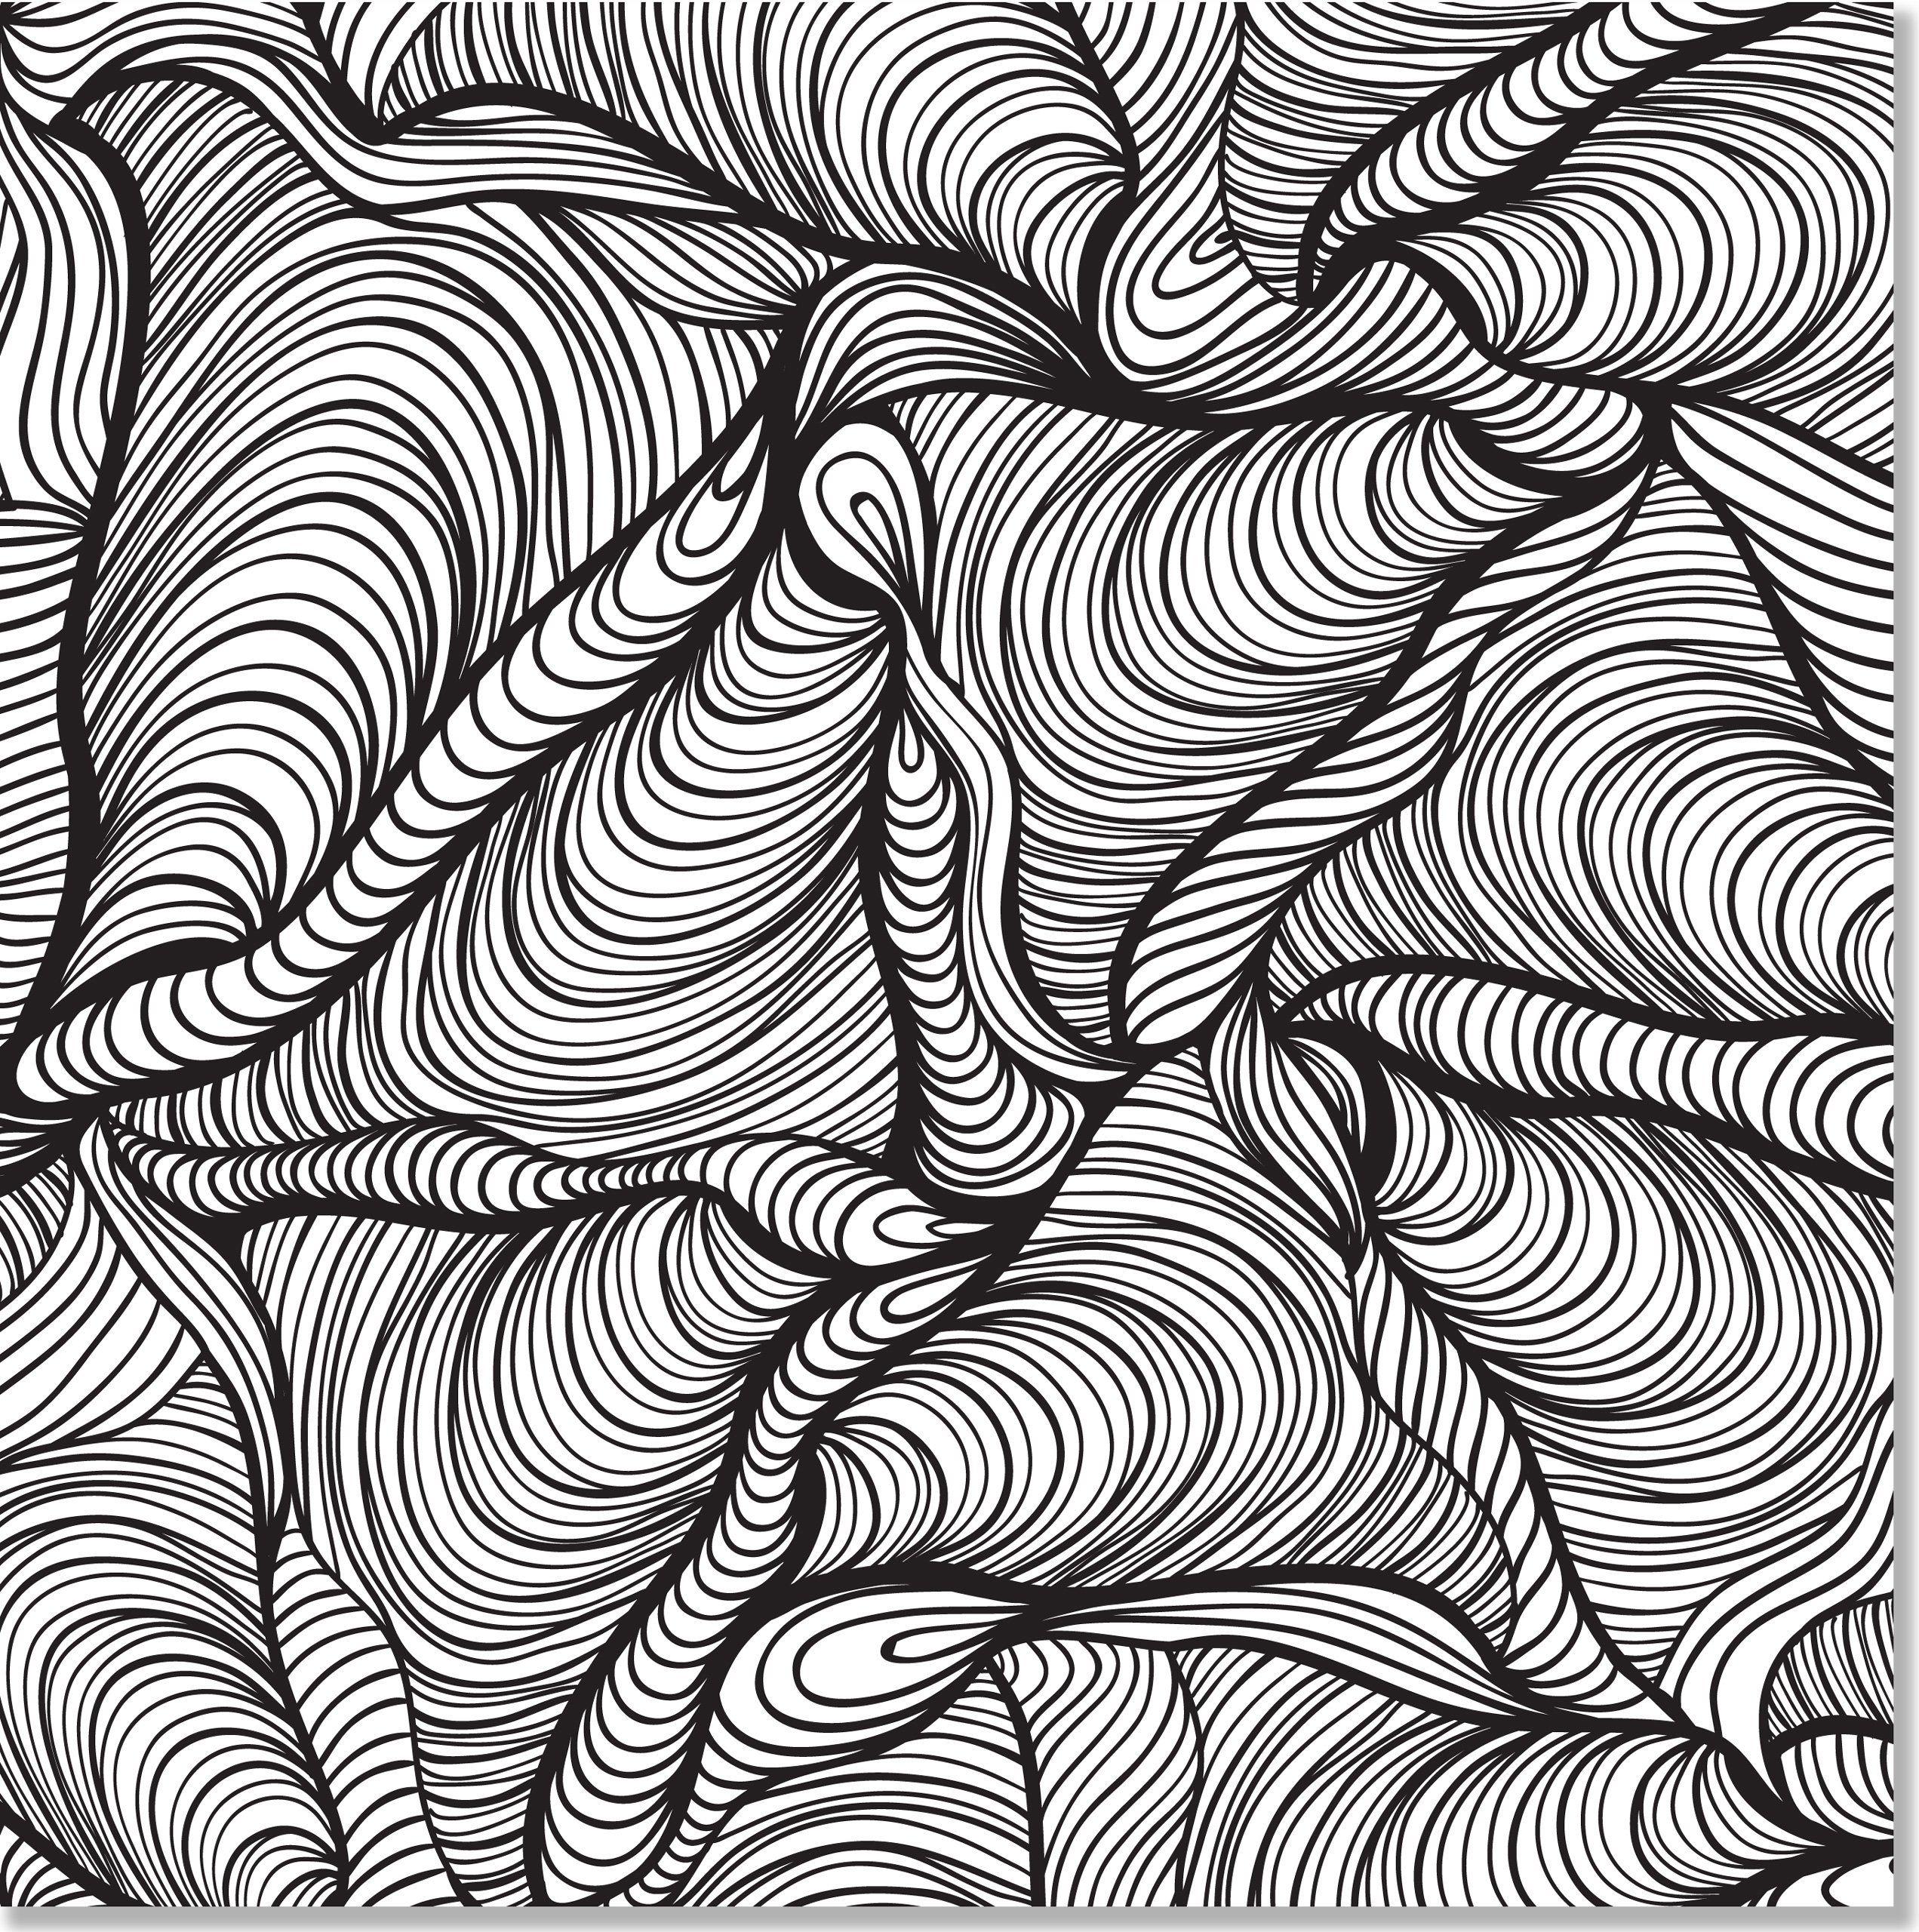 amazon com doodle designs coloring book 31 stress